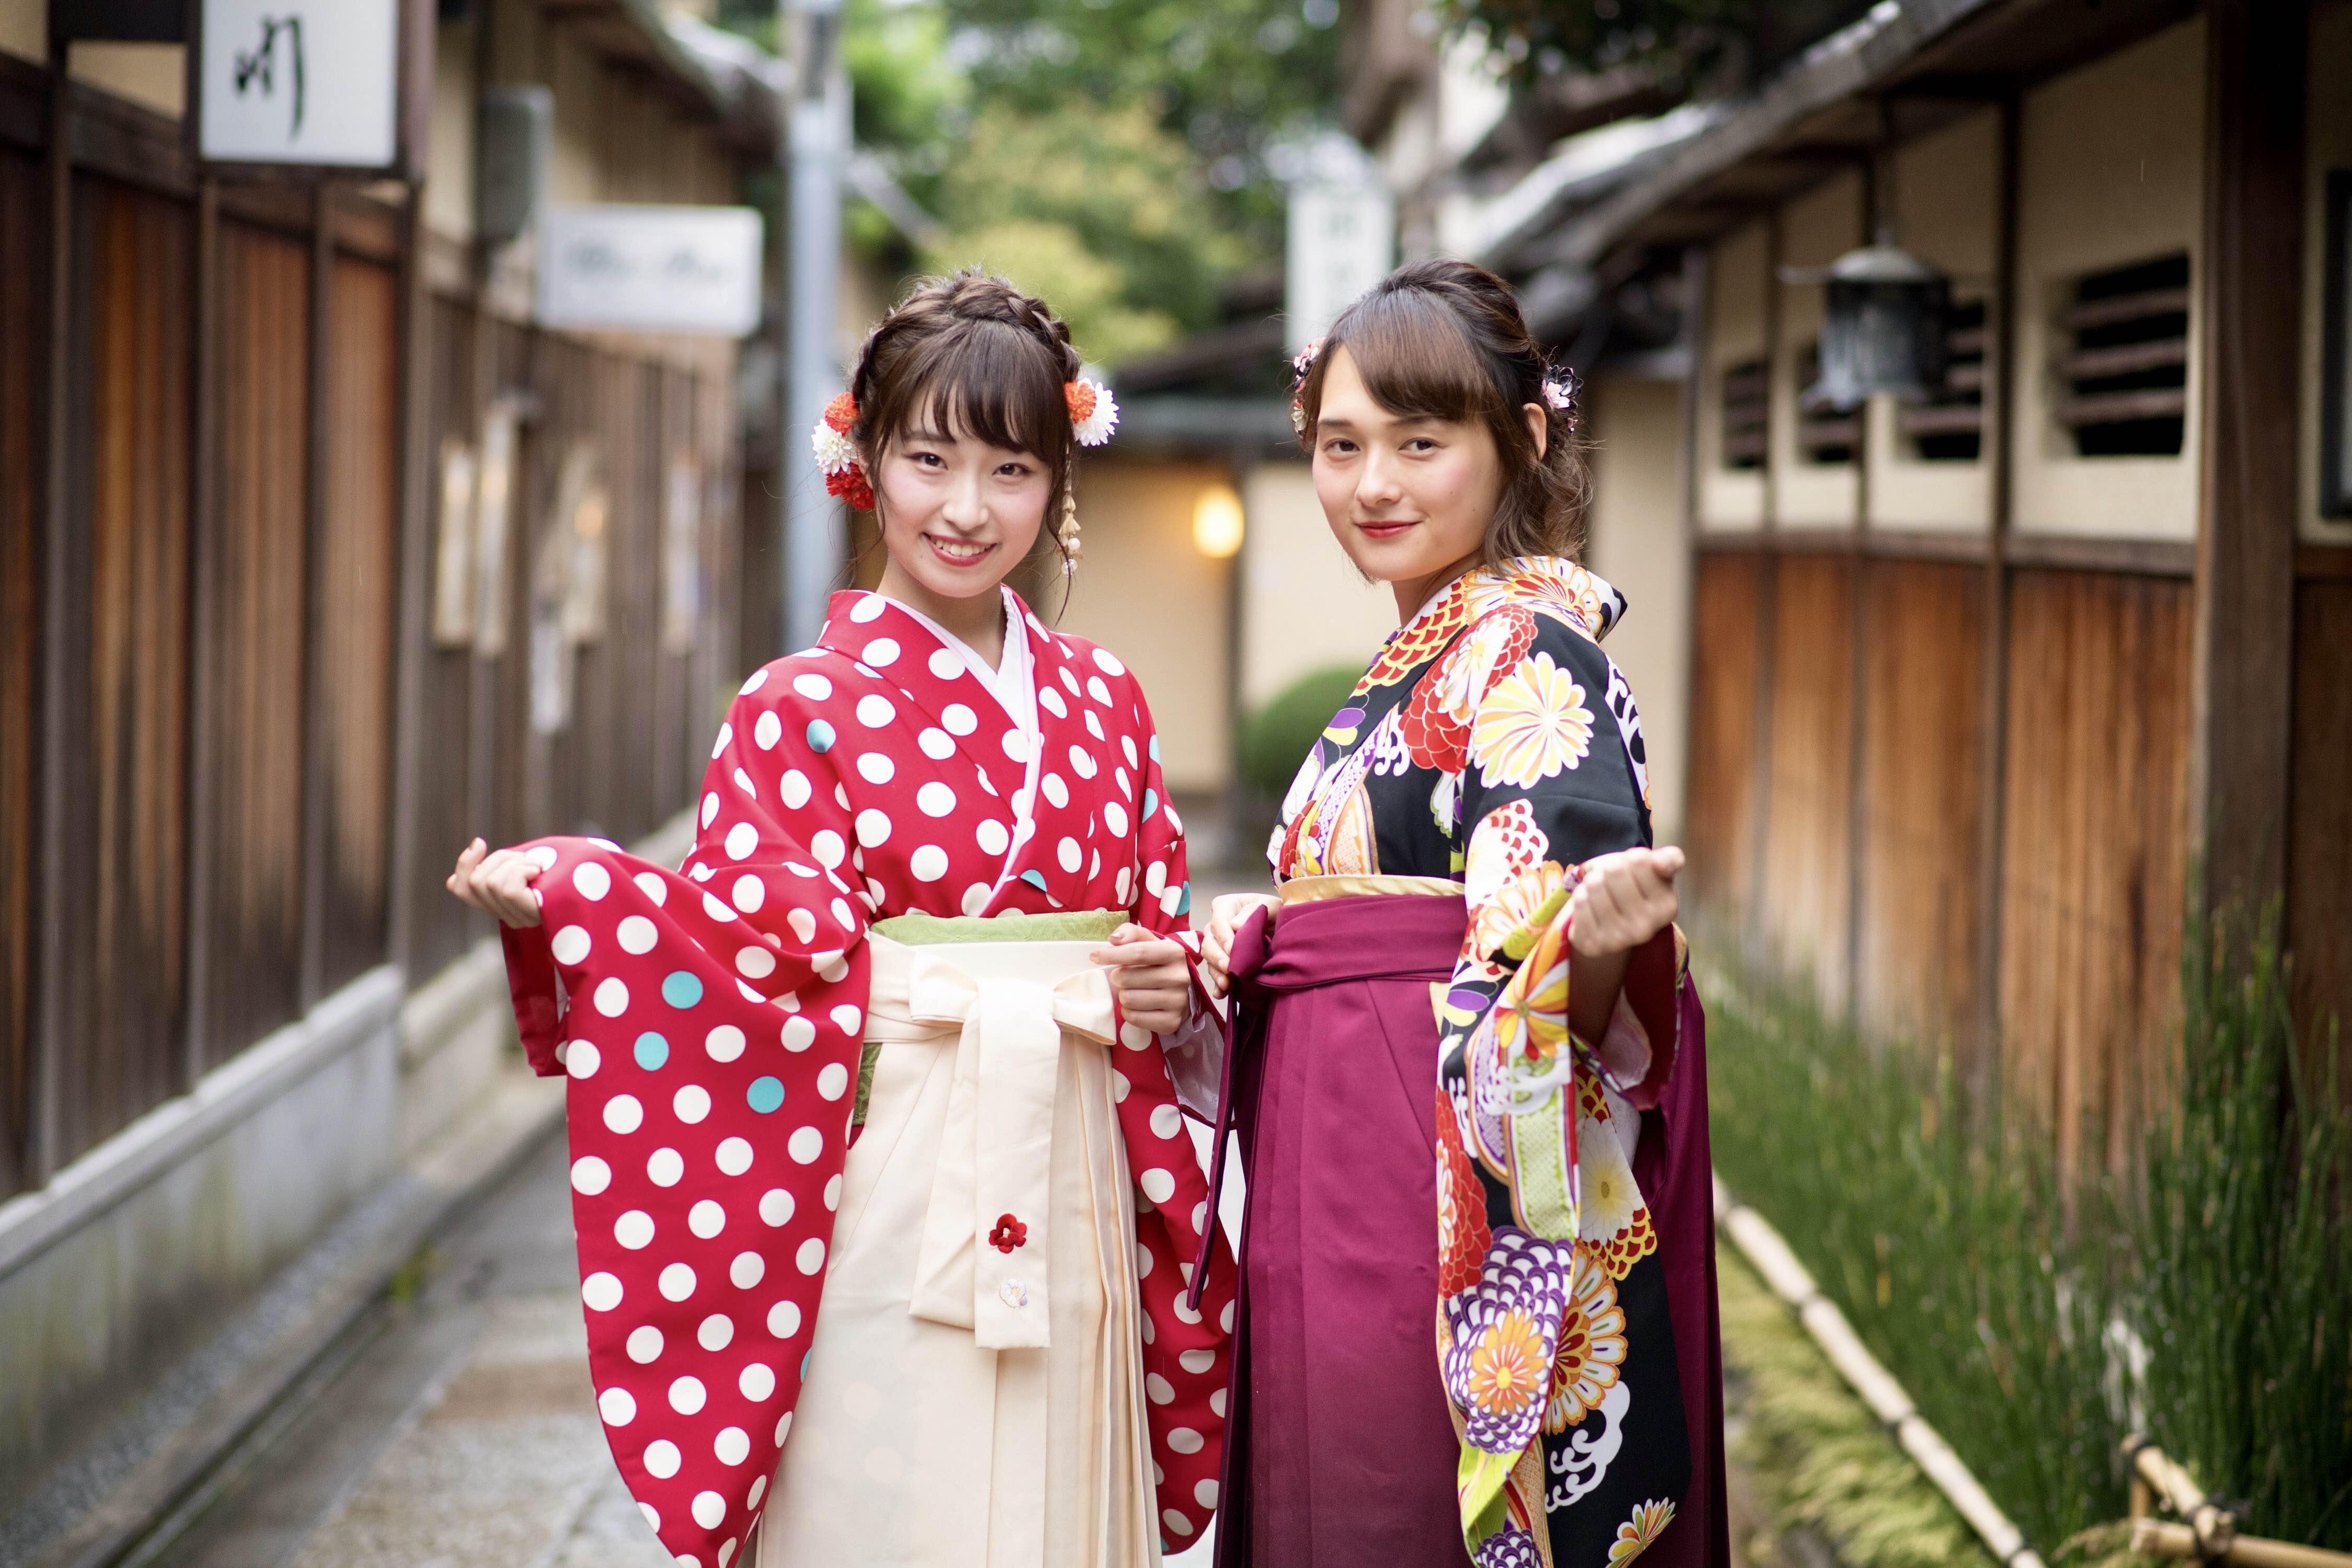 kimono bieu tuong van hoa nhat ban